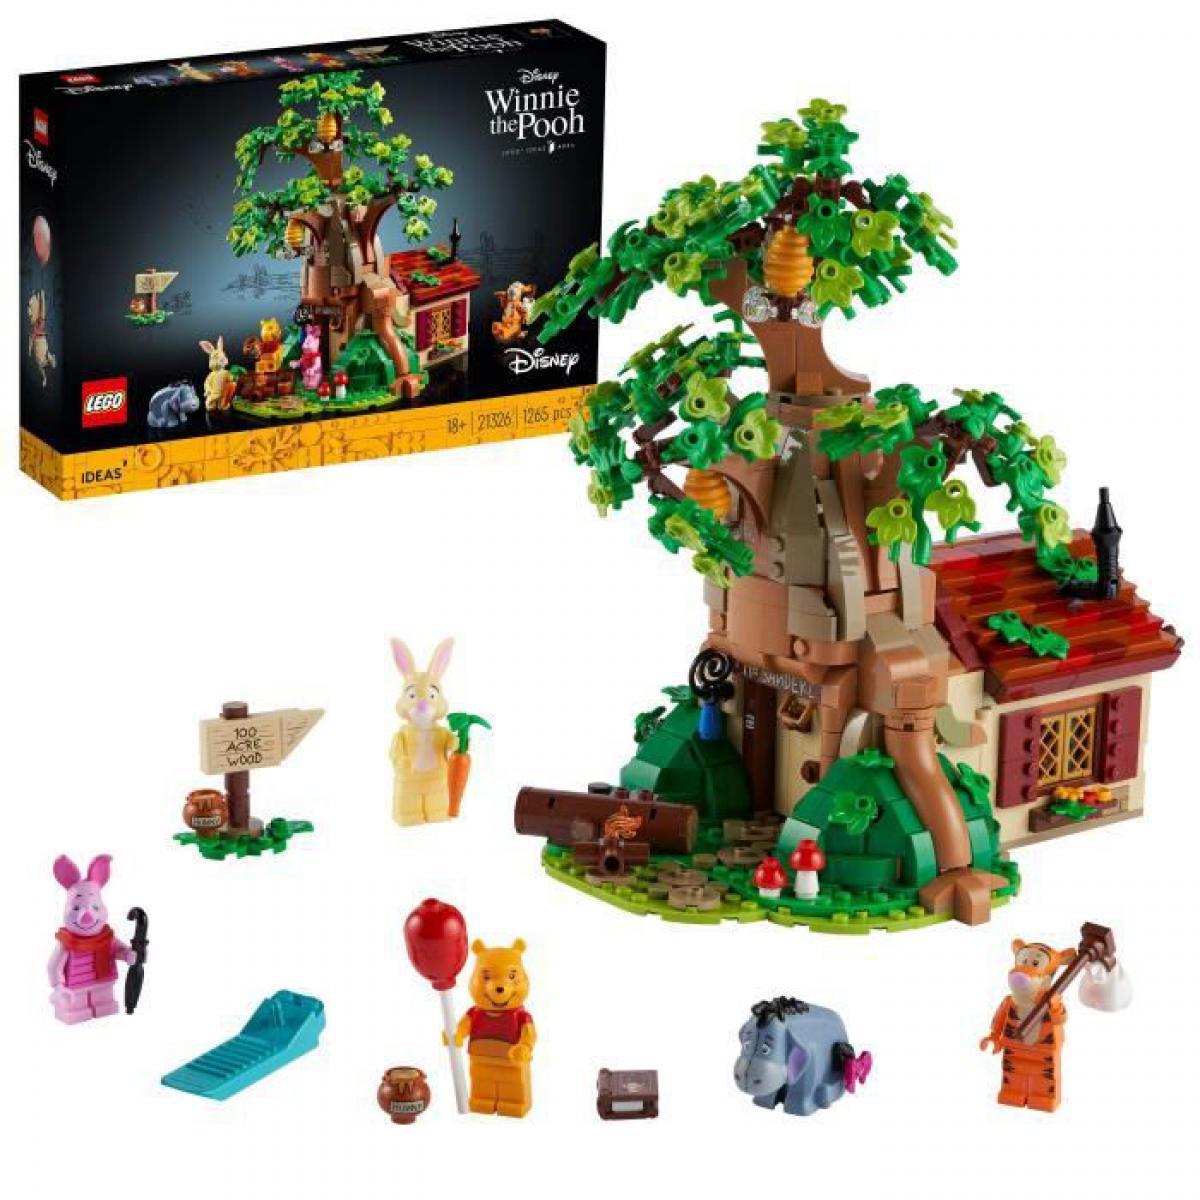 Lego LEGO 21326 Ideas Ensemble LEGO Disney pour adultes Winnie l'Ourson, Maison a exposer, Figurine LEGO Bourriquet, Figurine